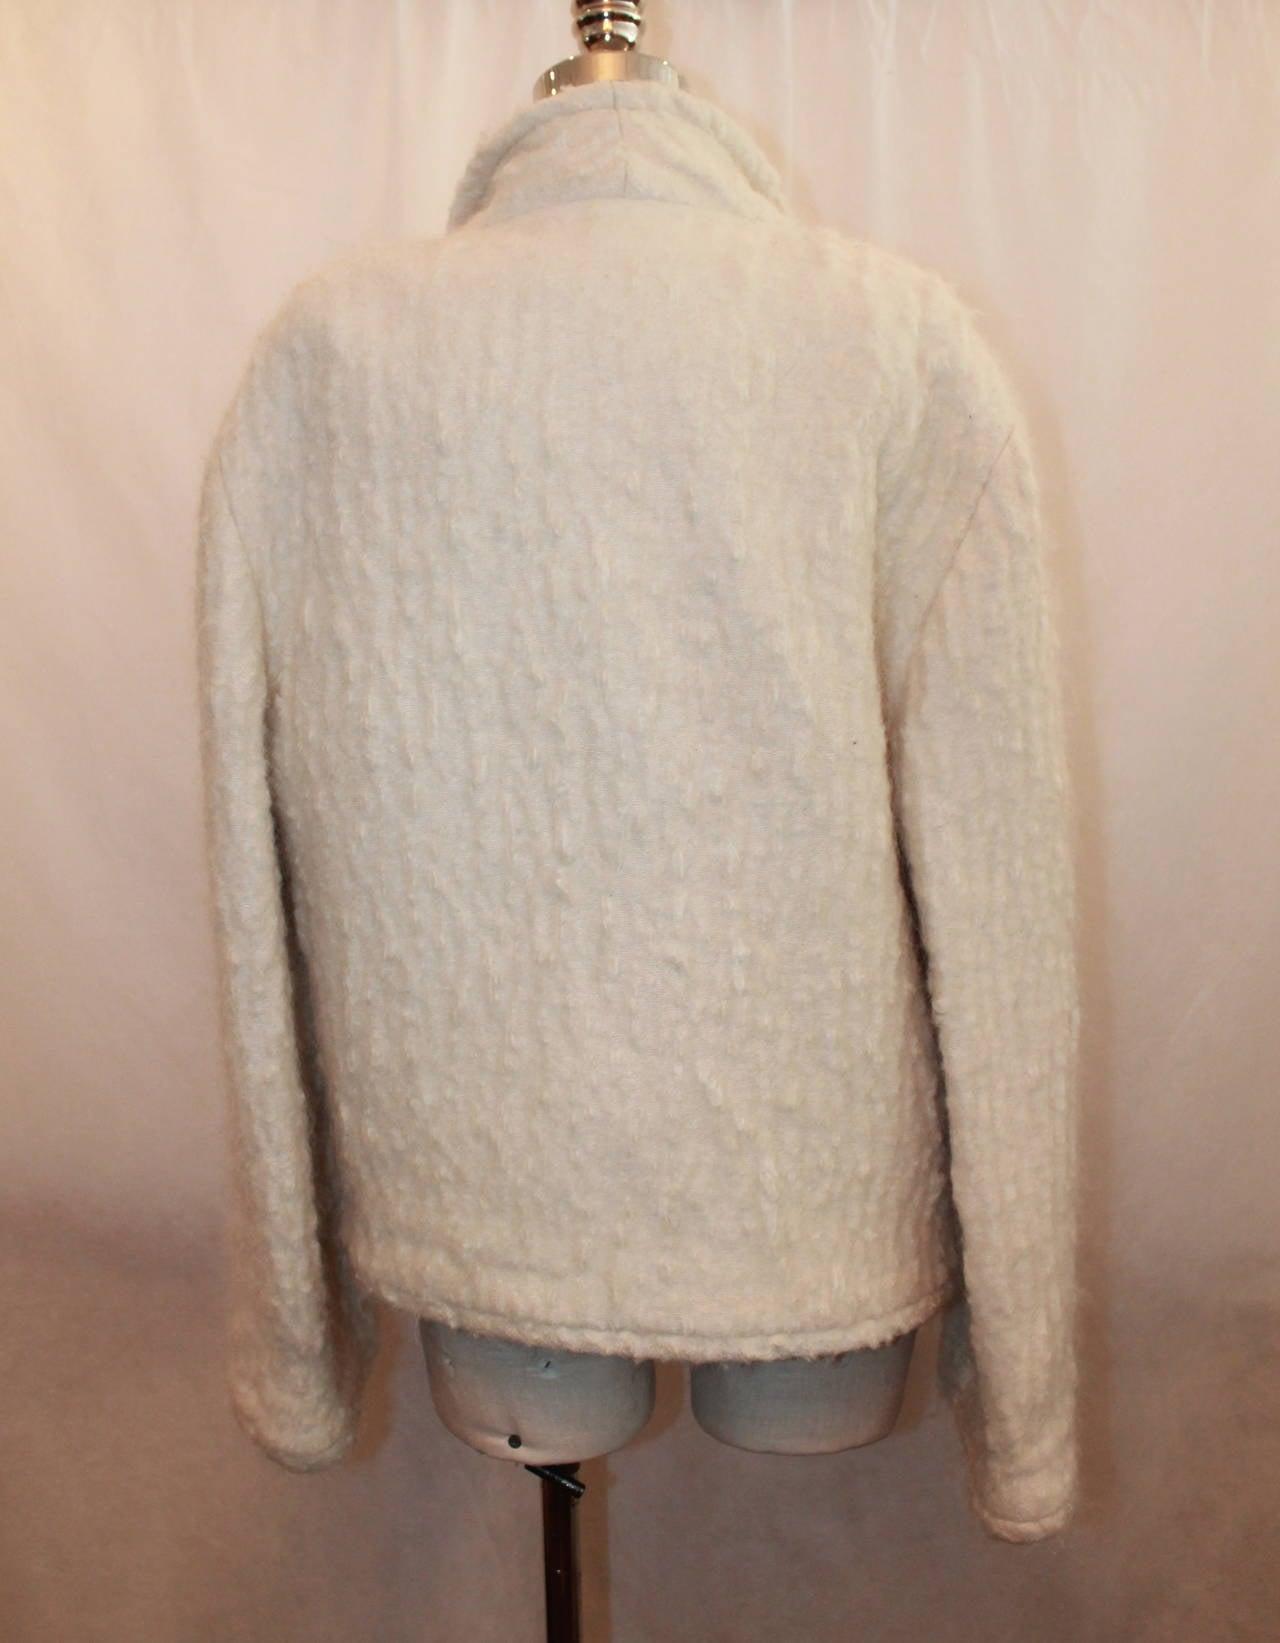 Chanel 1998 Vintage Creme Mohair & Wool Blend Jacket - 38 6